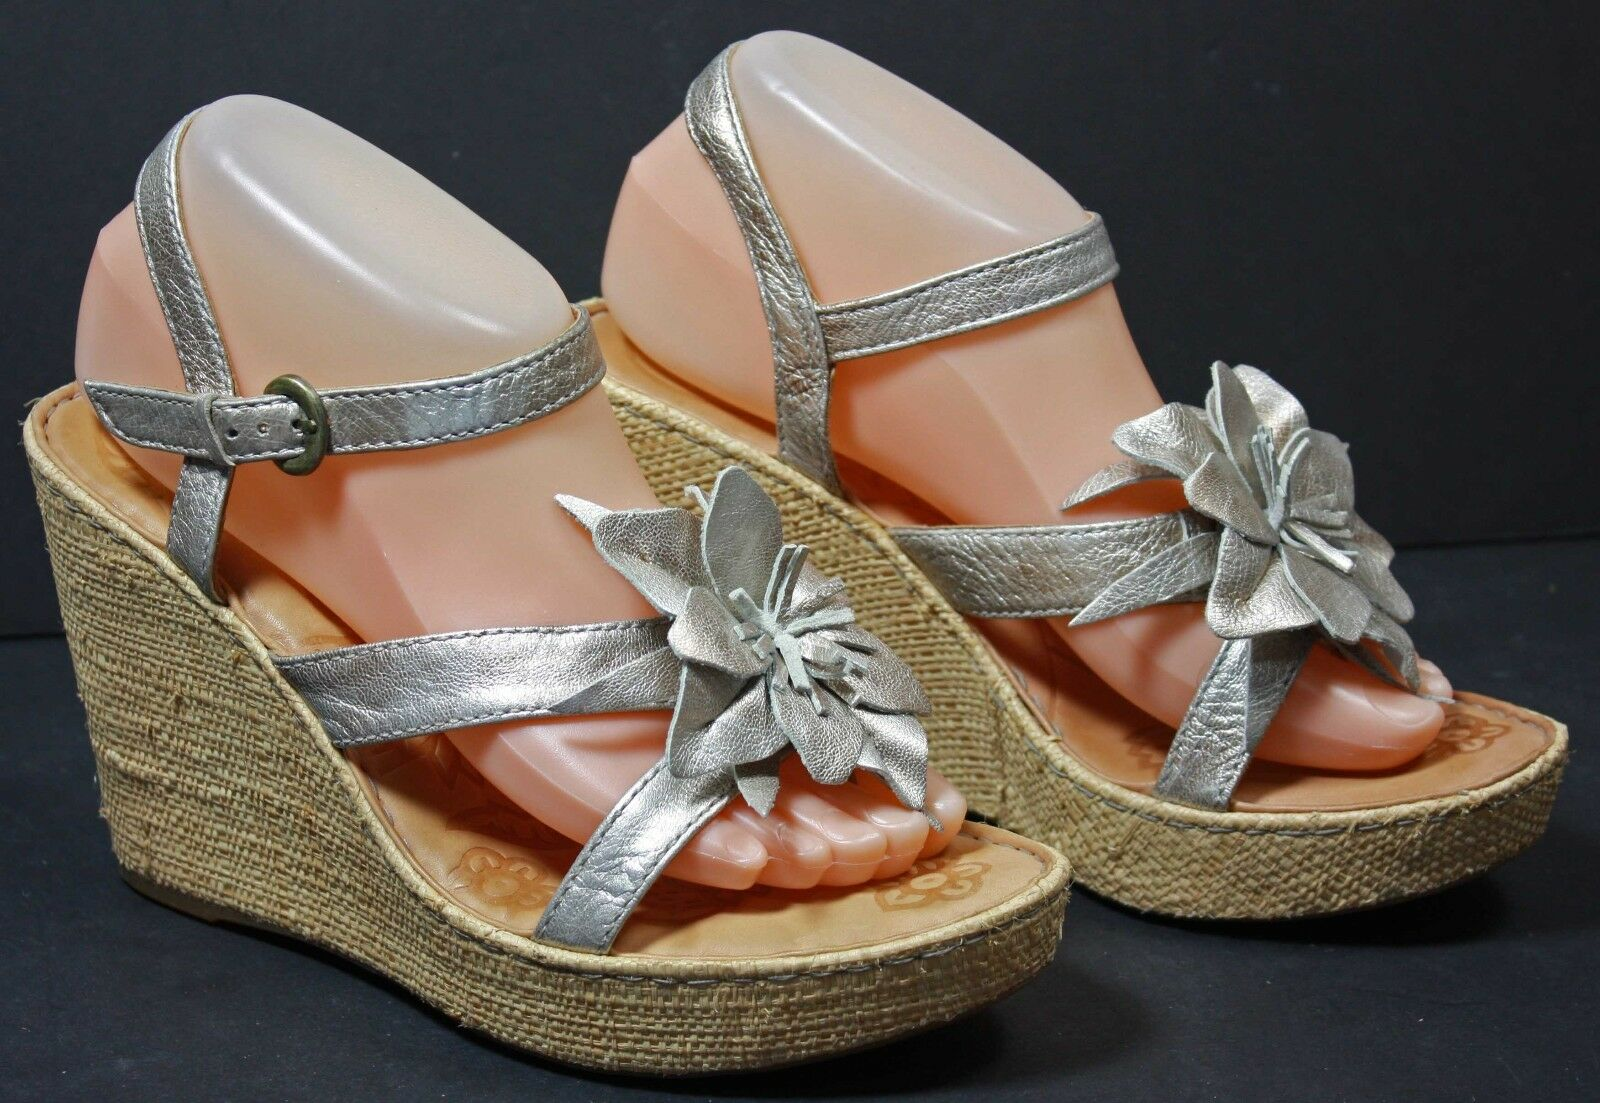 Born Womens Sandals size 9 M Metallic Silver Leather Platform Wedges WF1